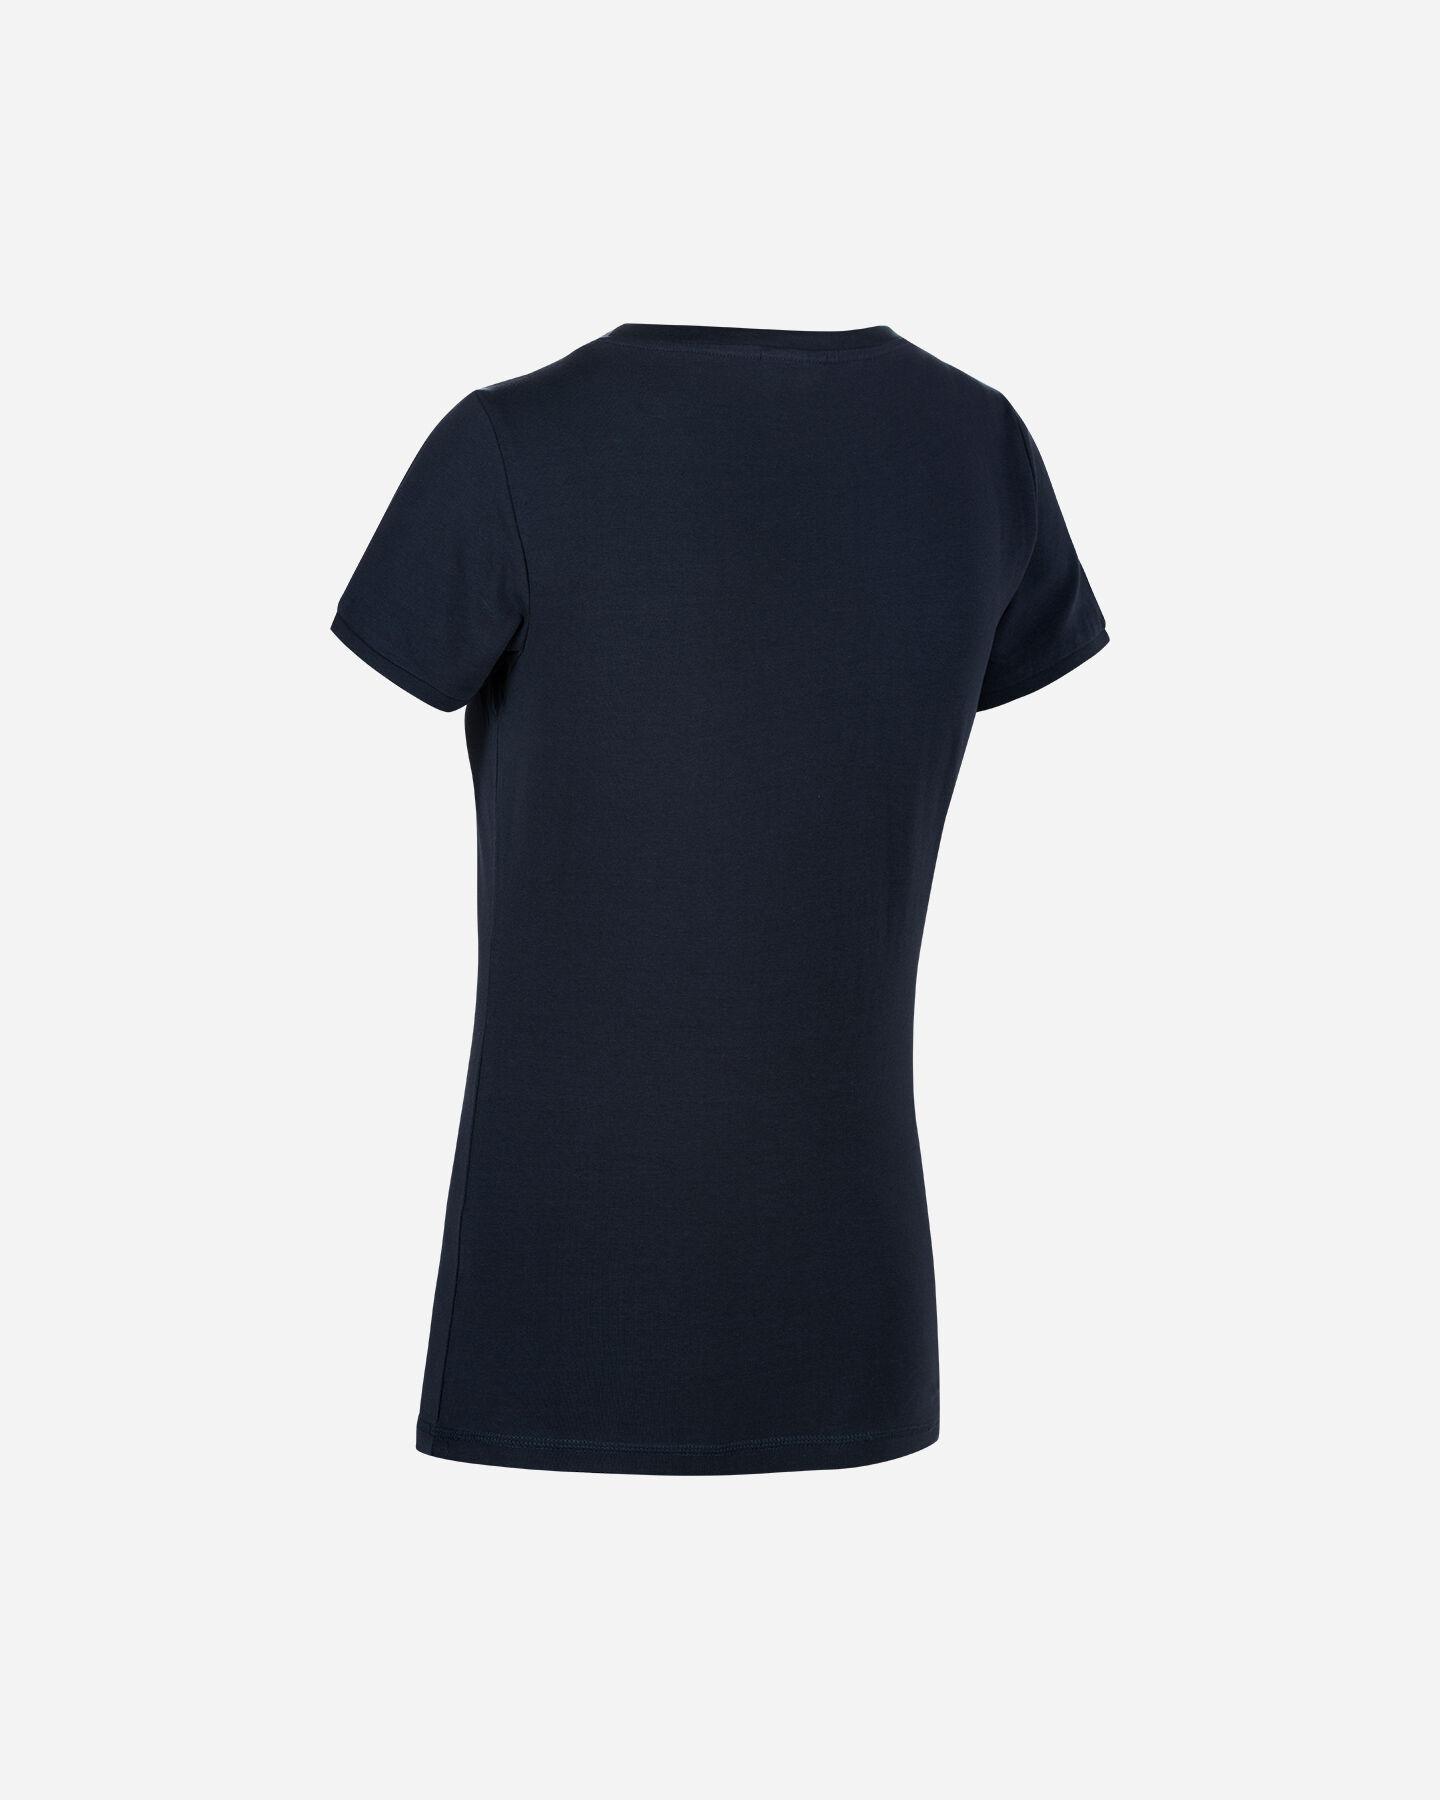 T-Shirt ABC MC GC BASIC W S1298297 scatto 1